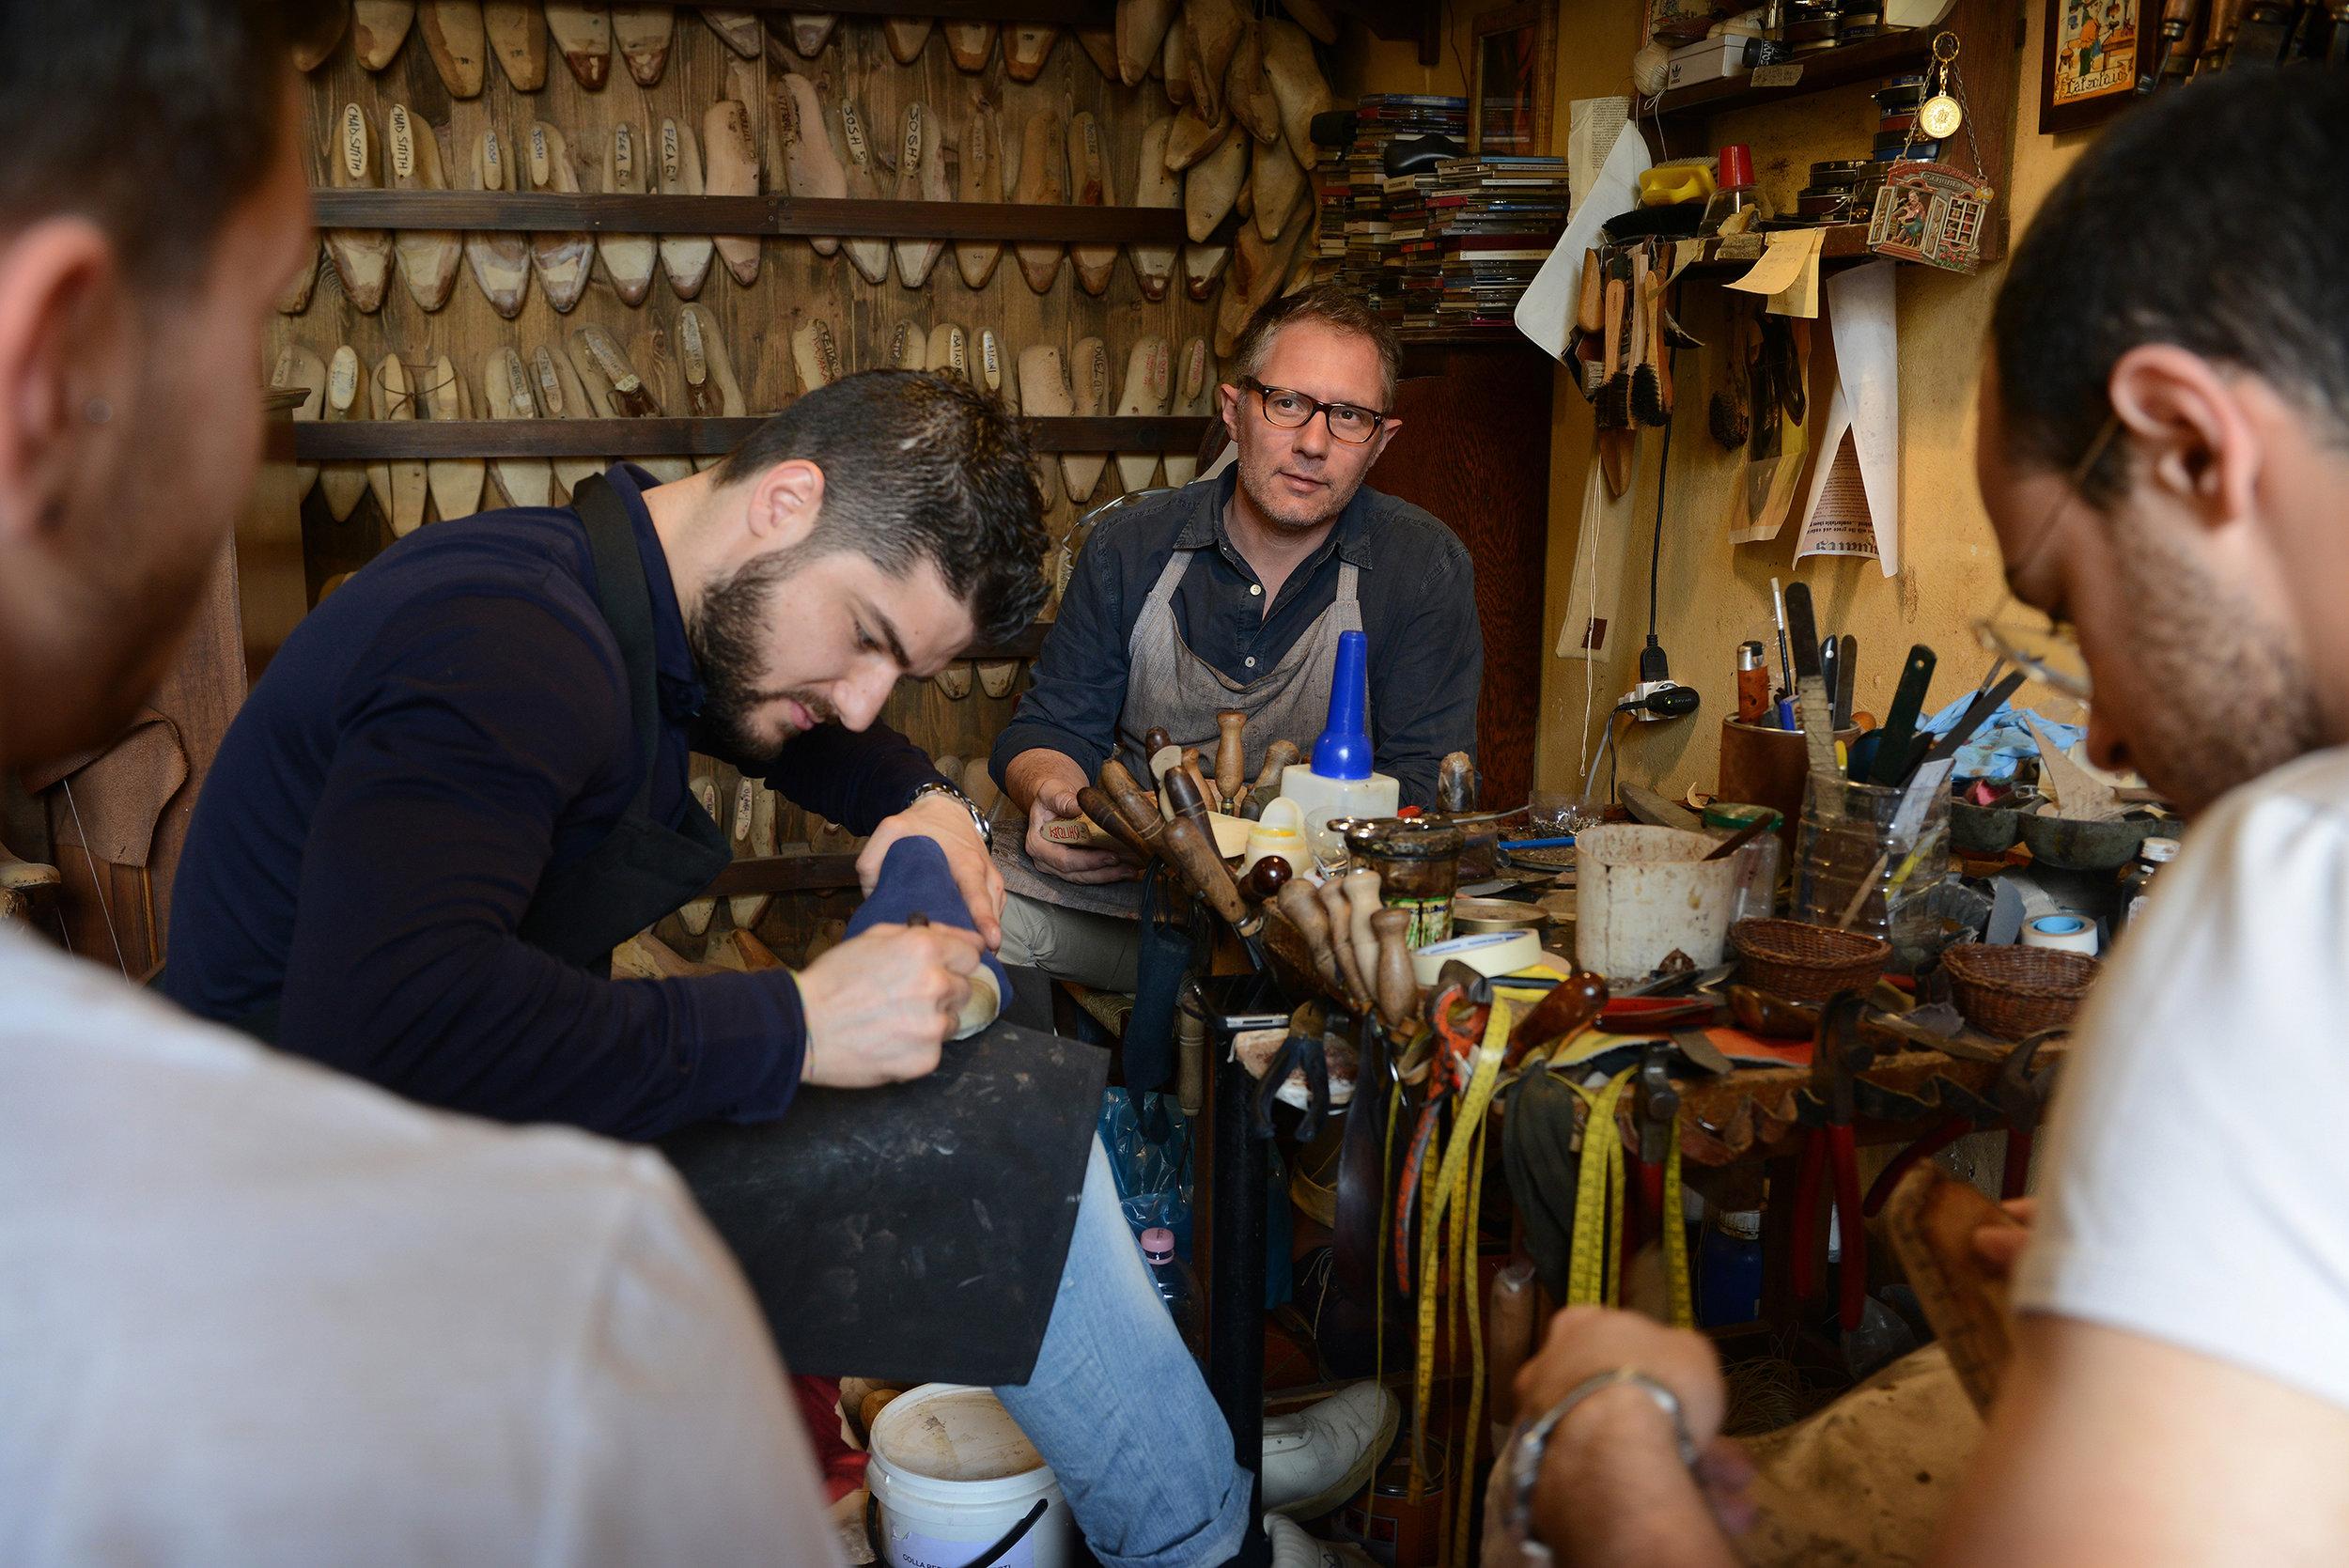 Italia, Firenze, Toscana, kenkäkauppa, Roberto Ugolini